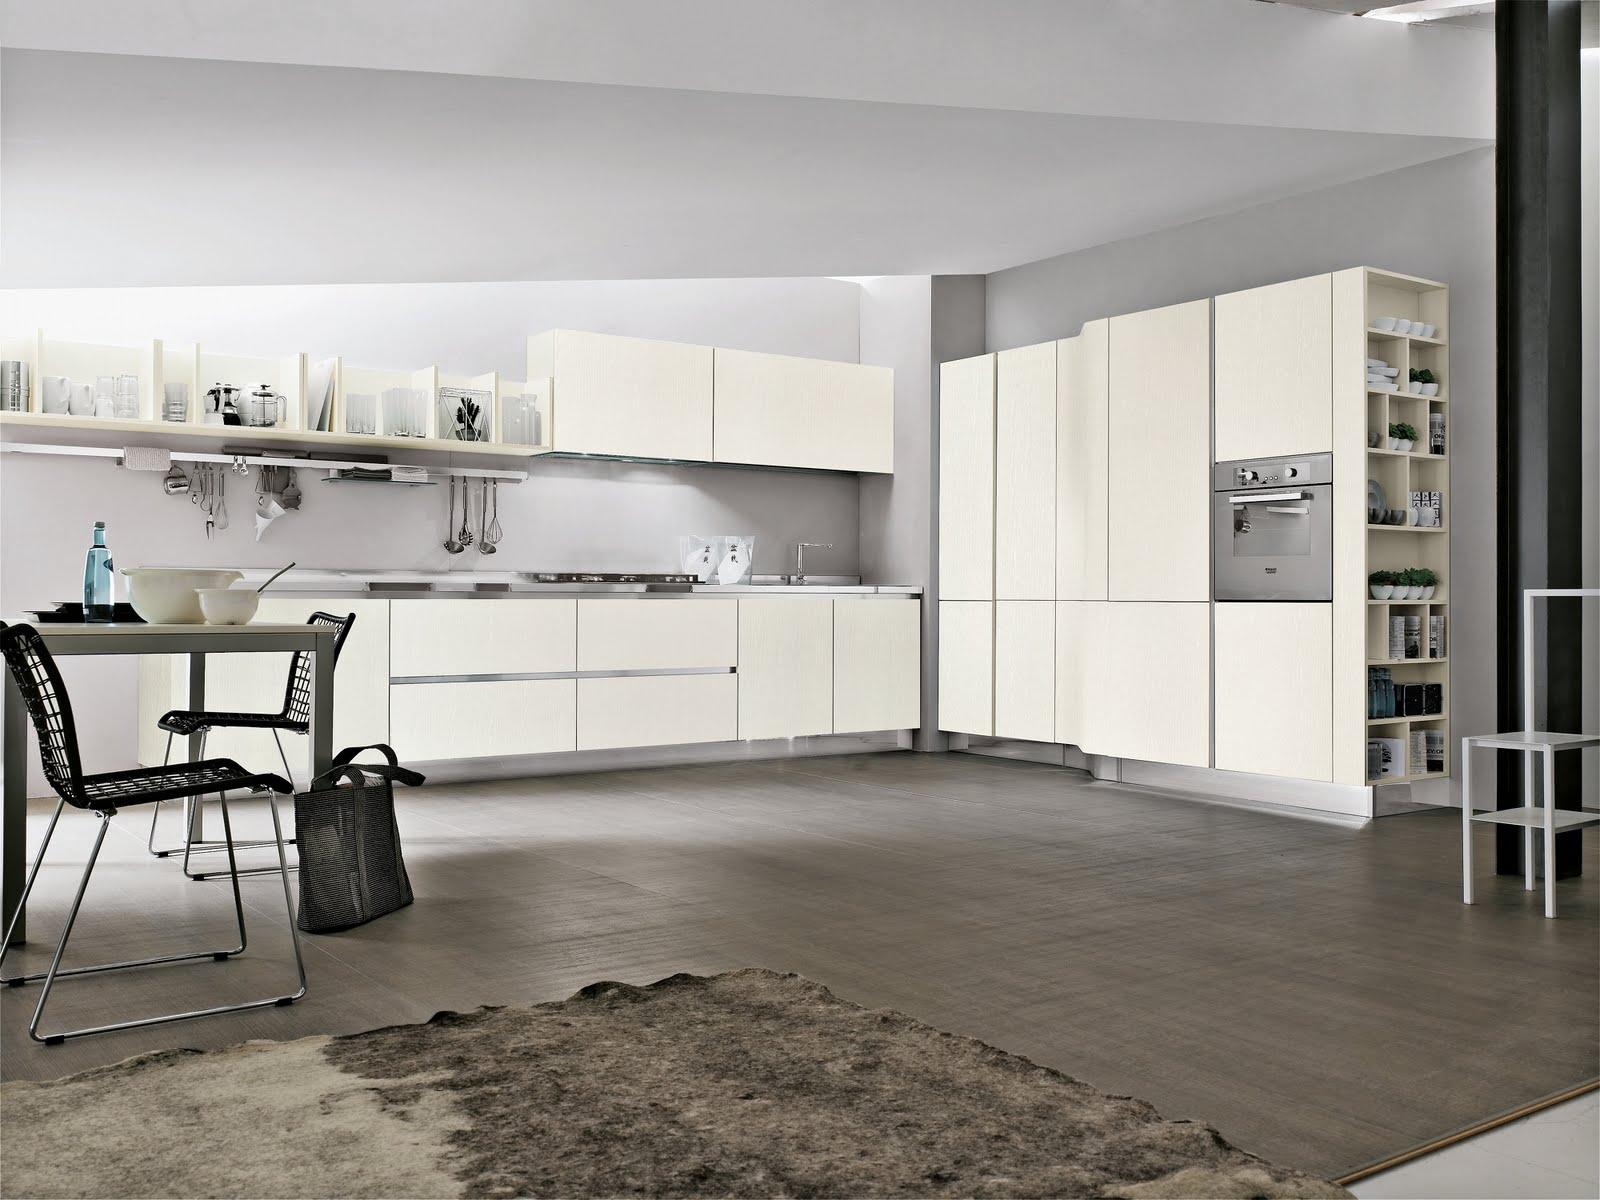 Le Migliori Cucine Moderne. Cheap Cucine Moderno Stosa ...